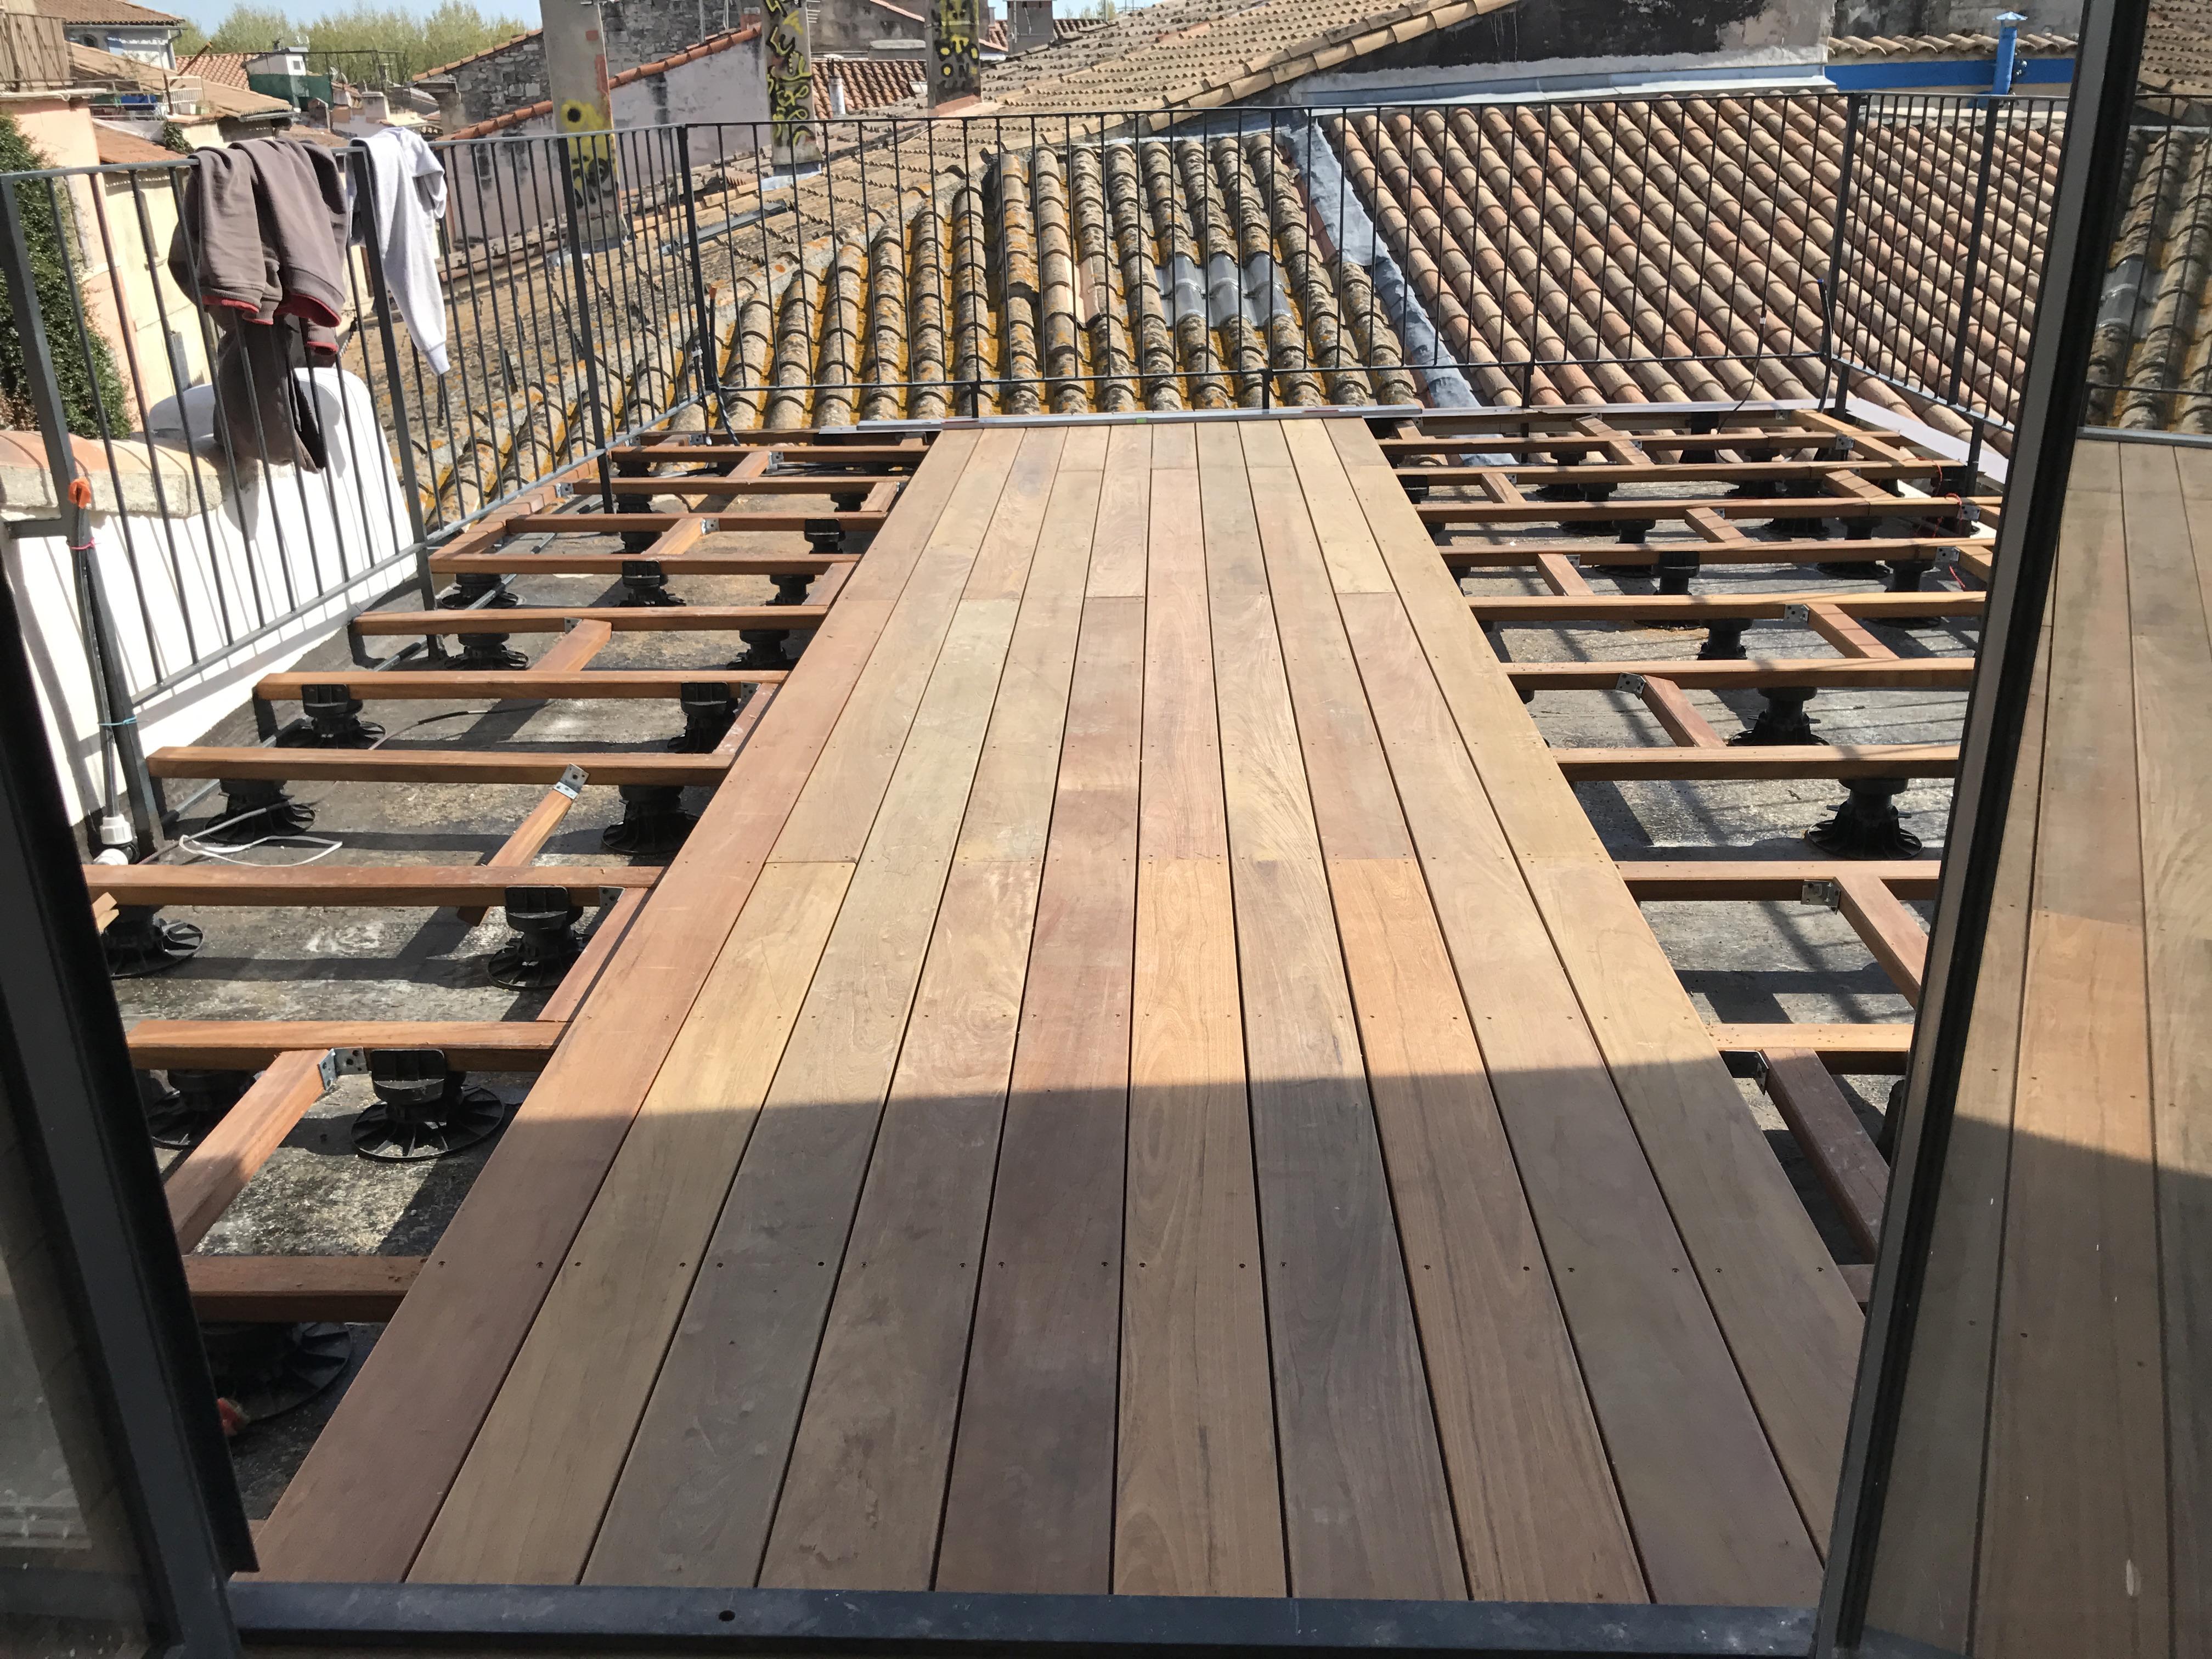 terrasse accessible en lames de bois ipe barale tanch it. Black Bedroom Furniture Sets. Home Design Ideas